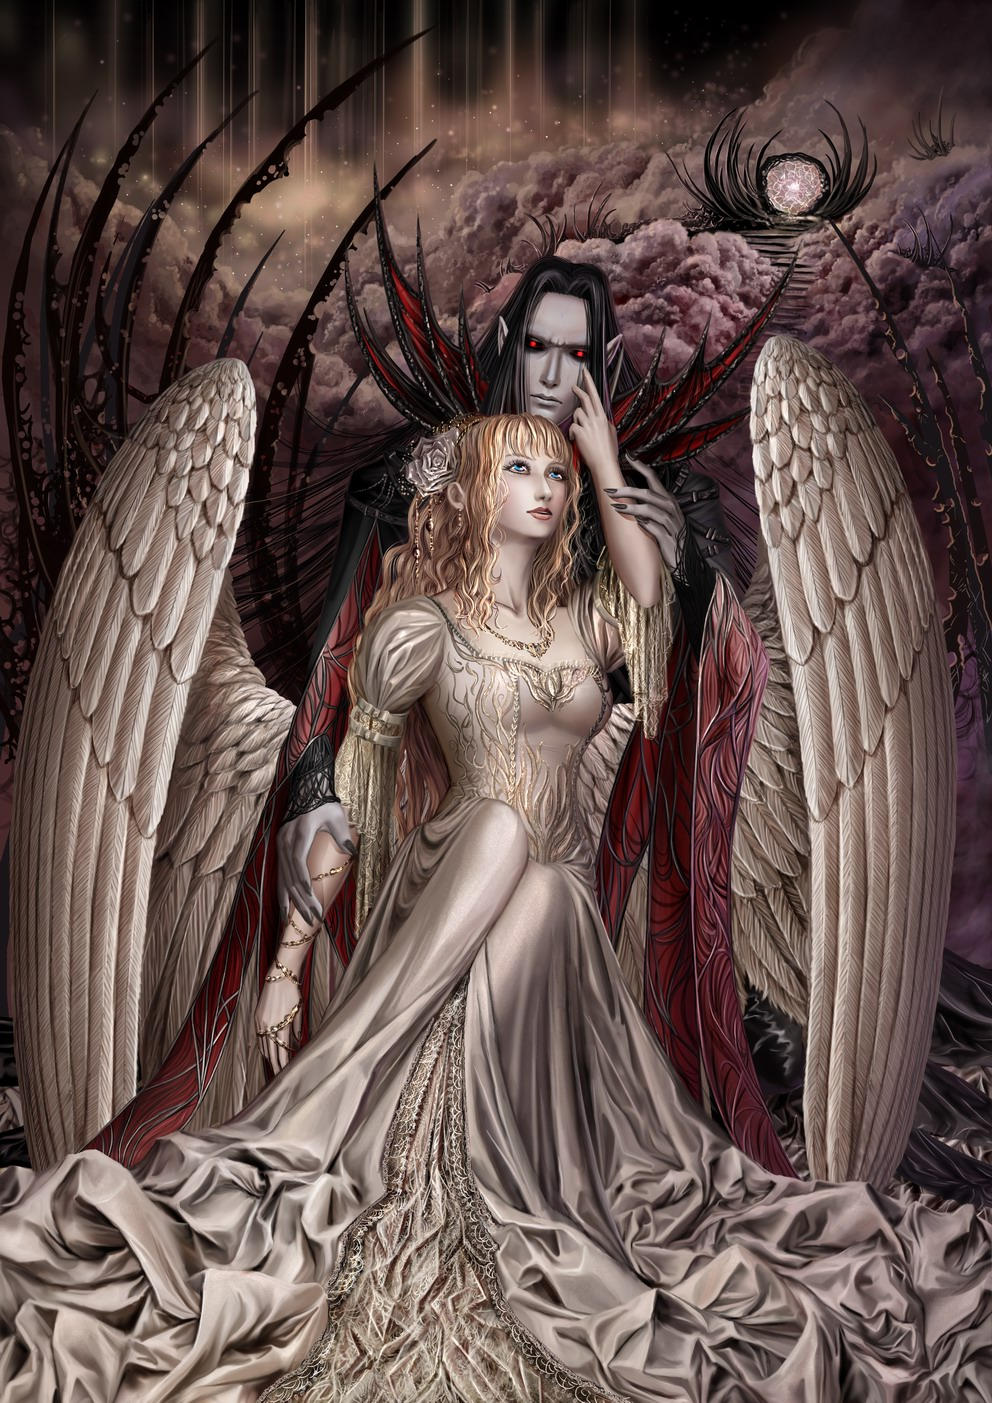 Beauty and the Beast by Irulana